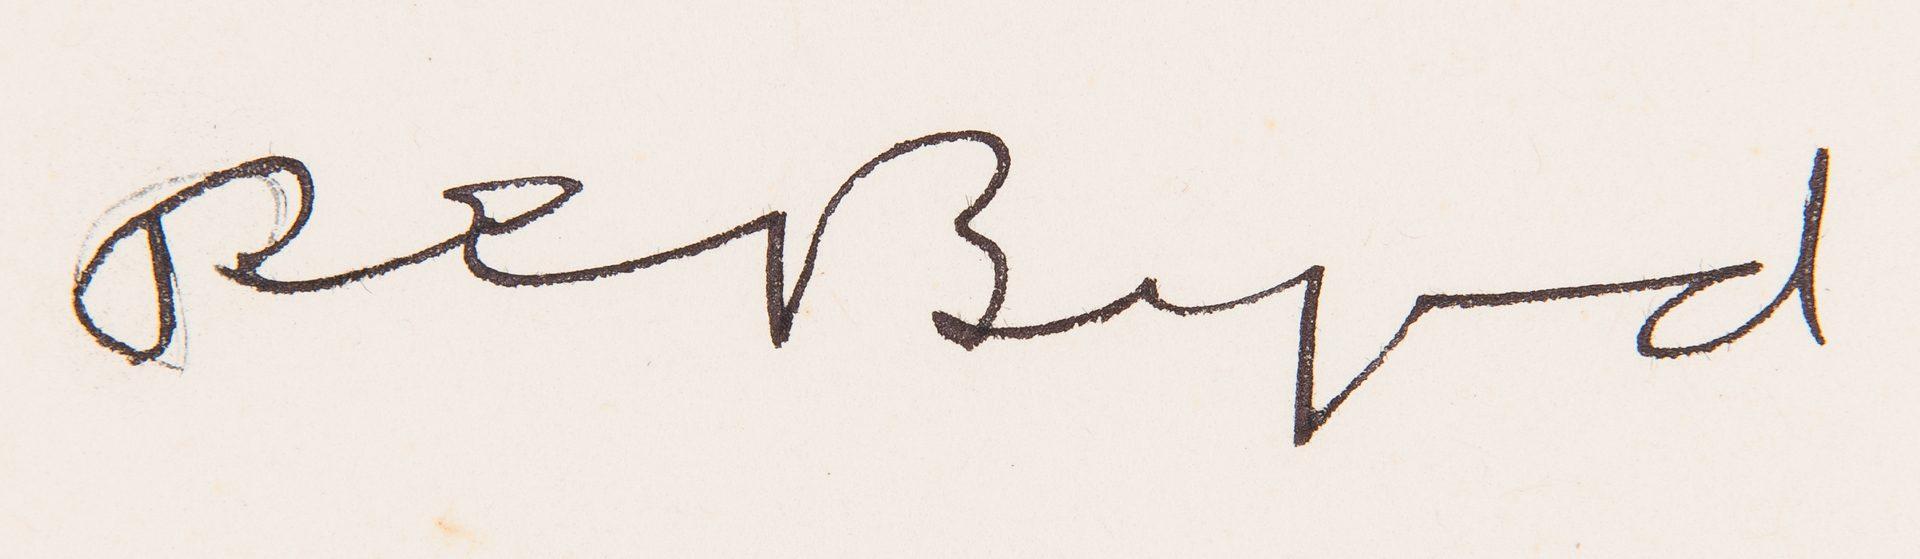 Lot 292: 15 Biographies/AutoBiog, Most Signed